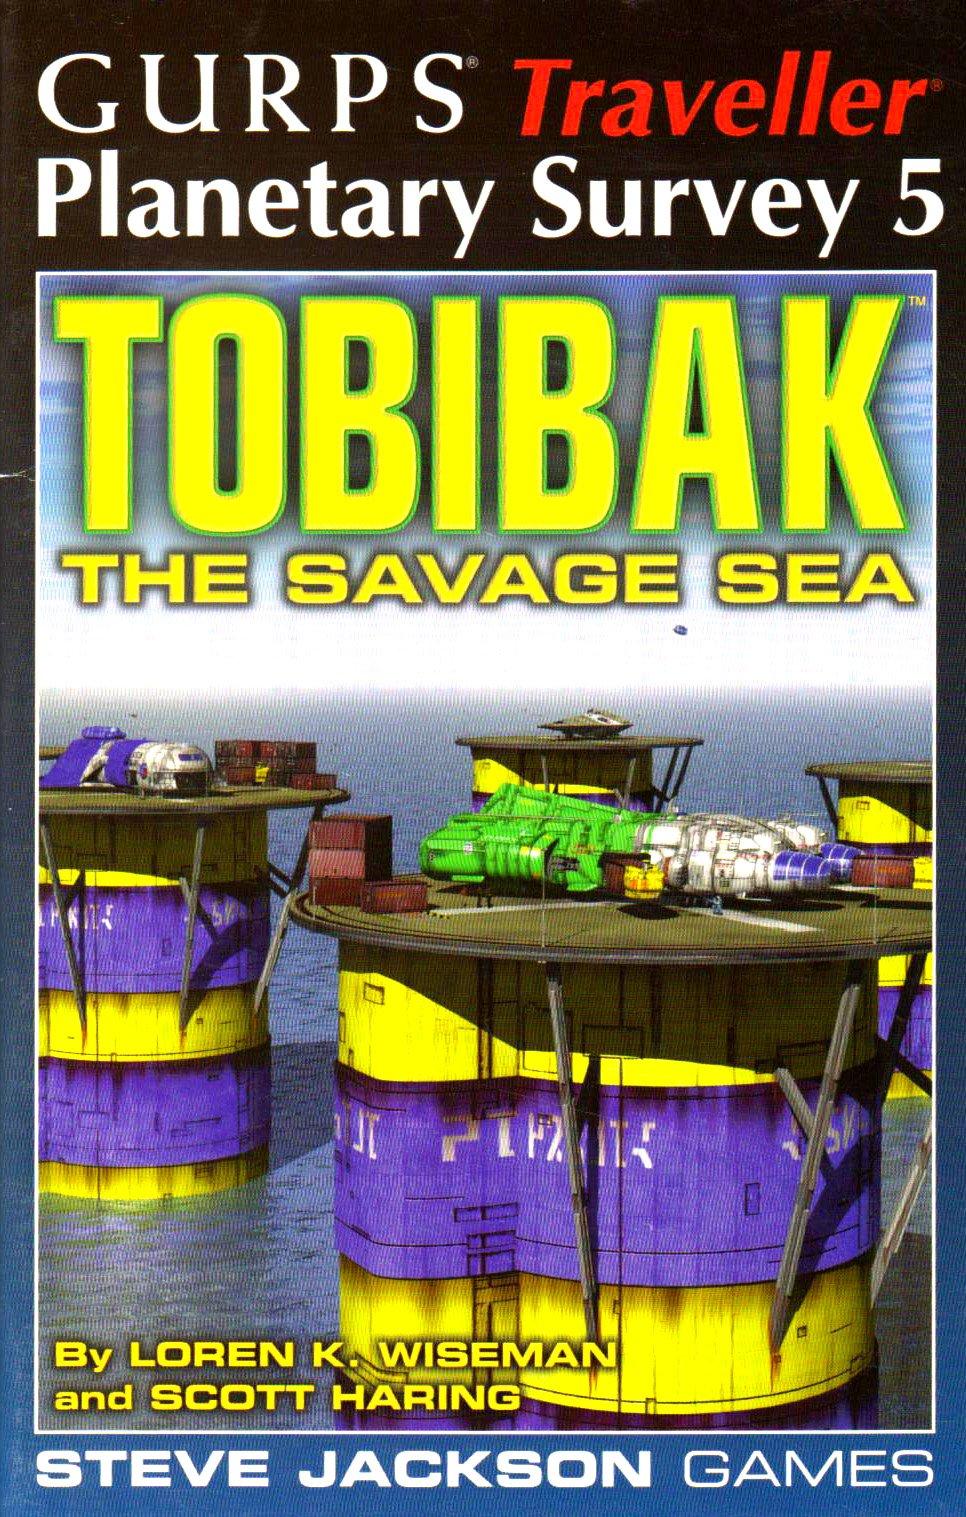 GURPS Traveller Planetary Survey 5: Tobibak: The Savage Sea